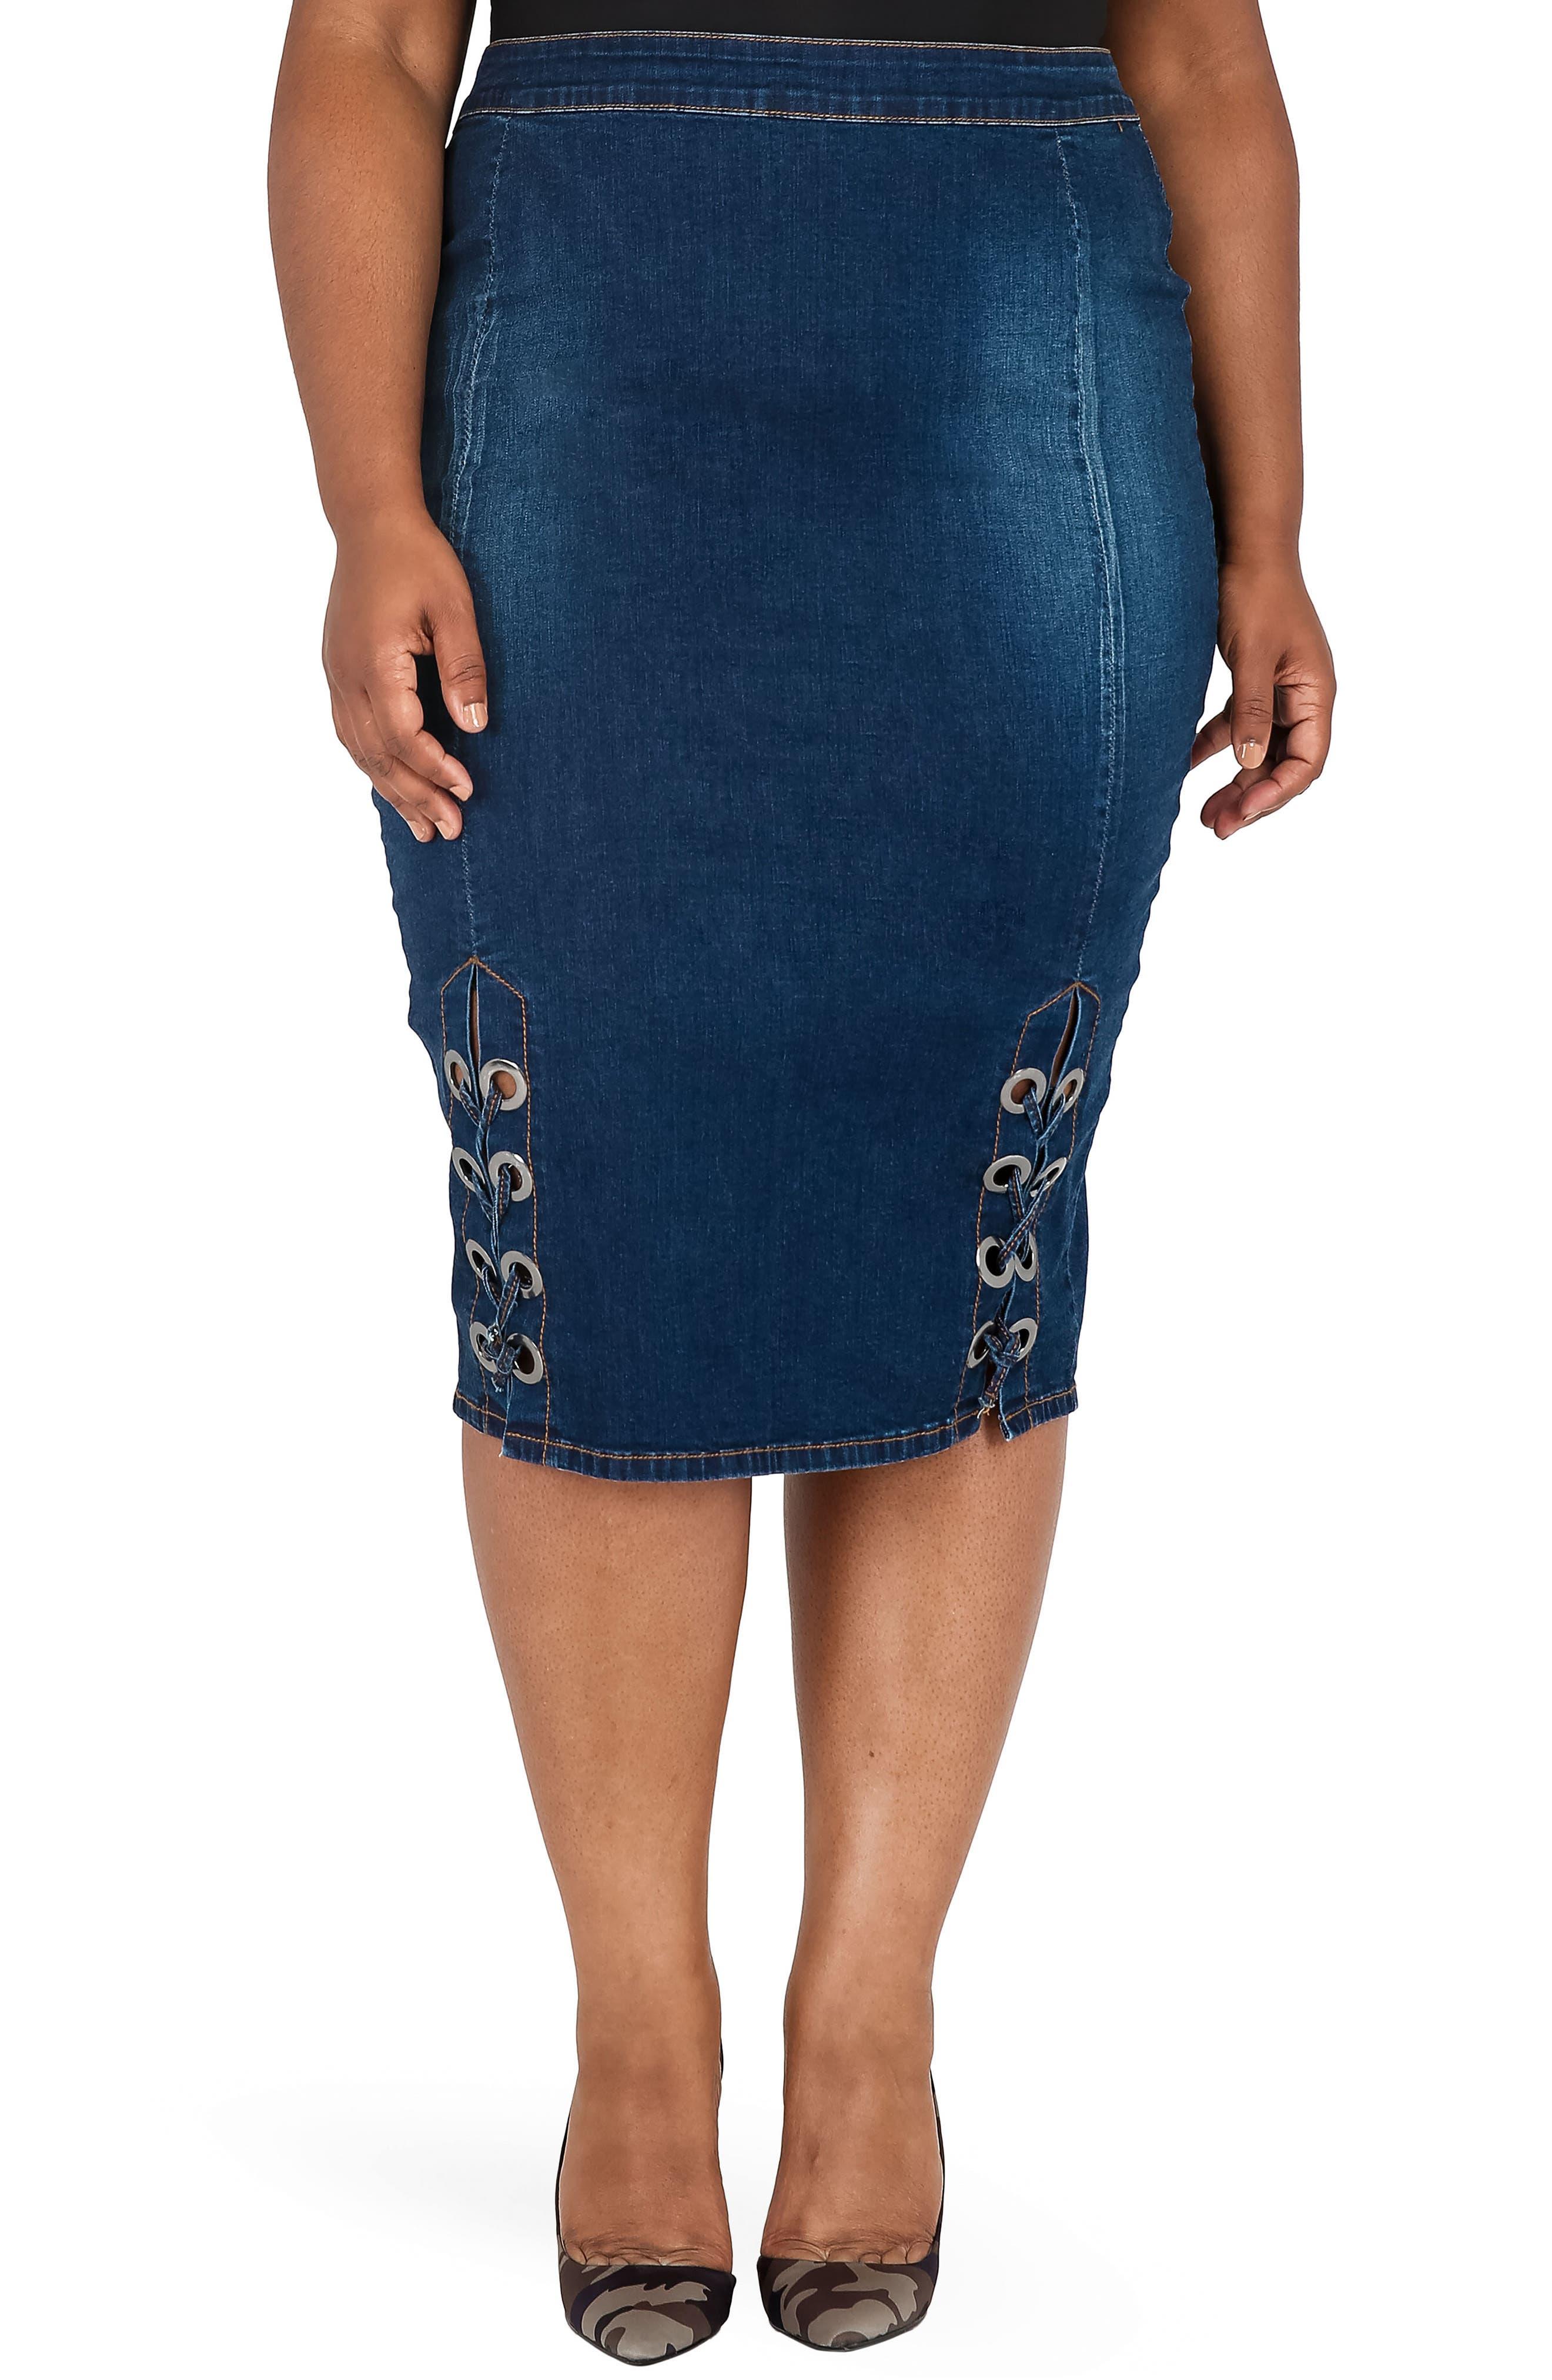 Eula Denim Skirt,                             Main thumbnail 1, color,                             BLUE